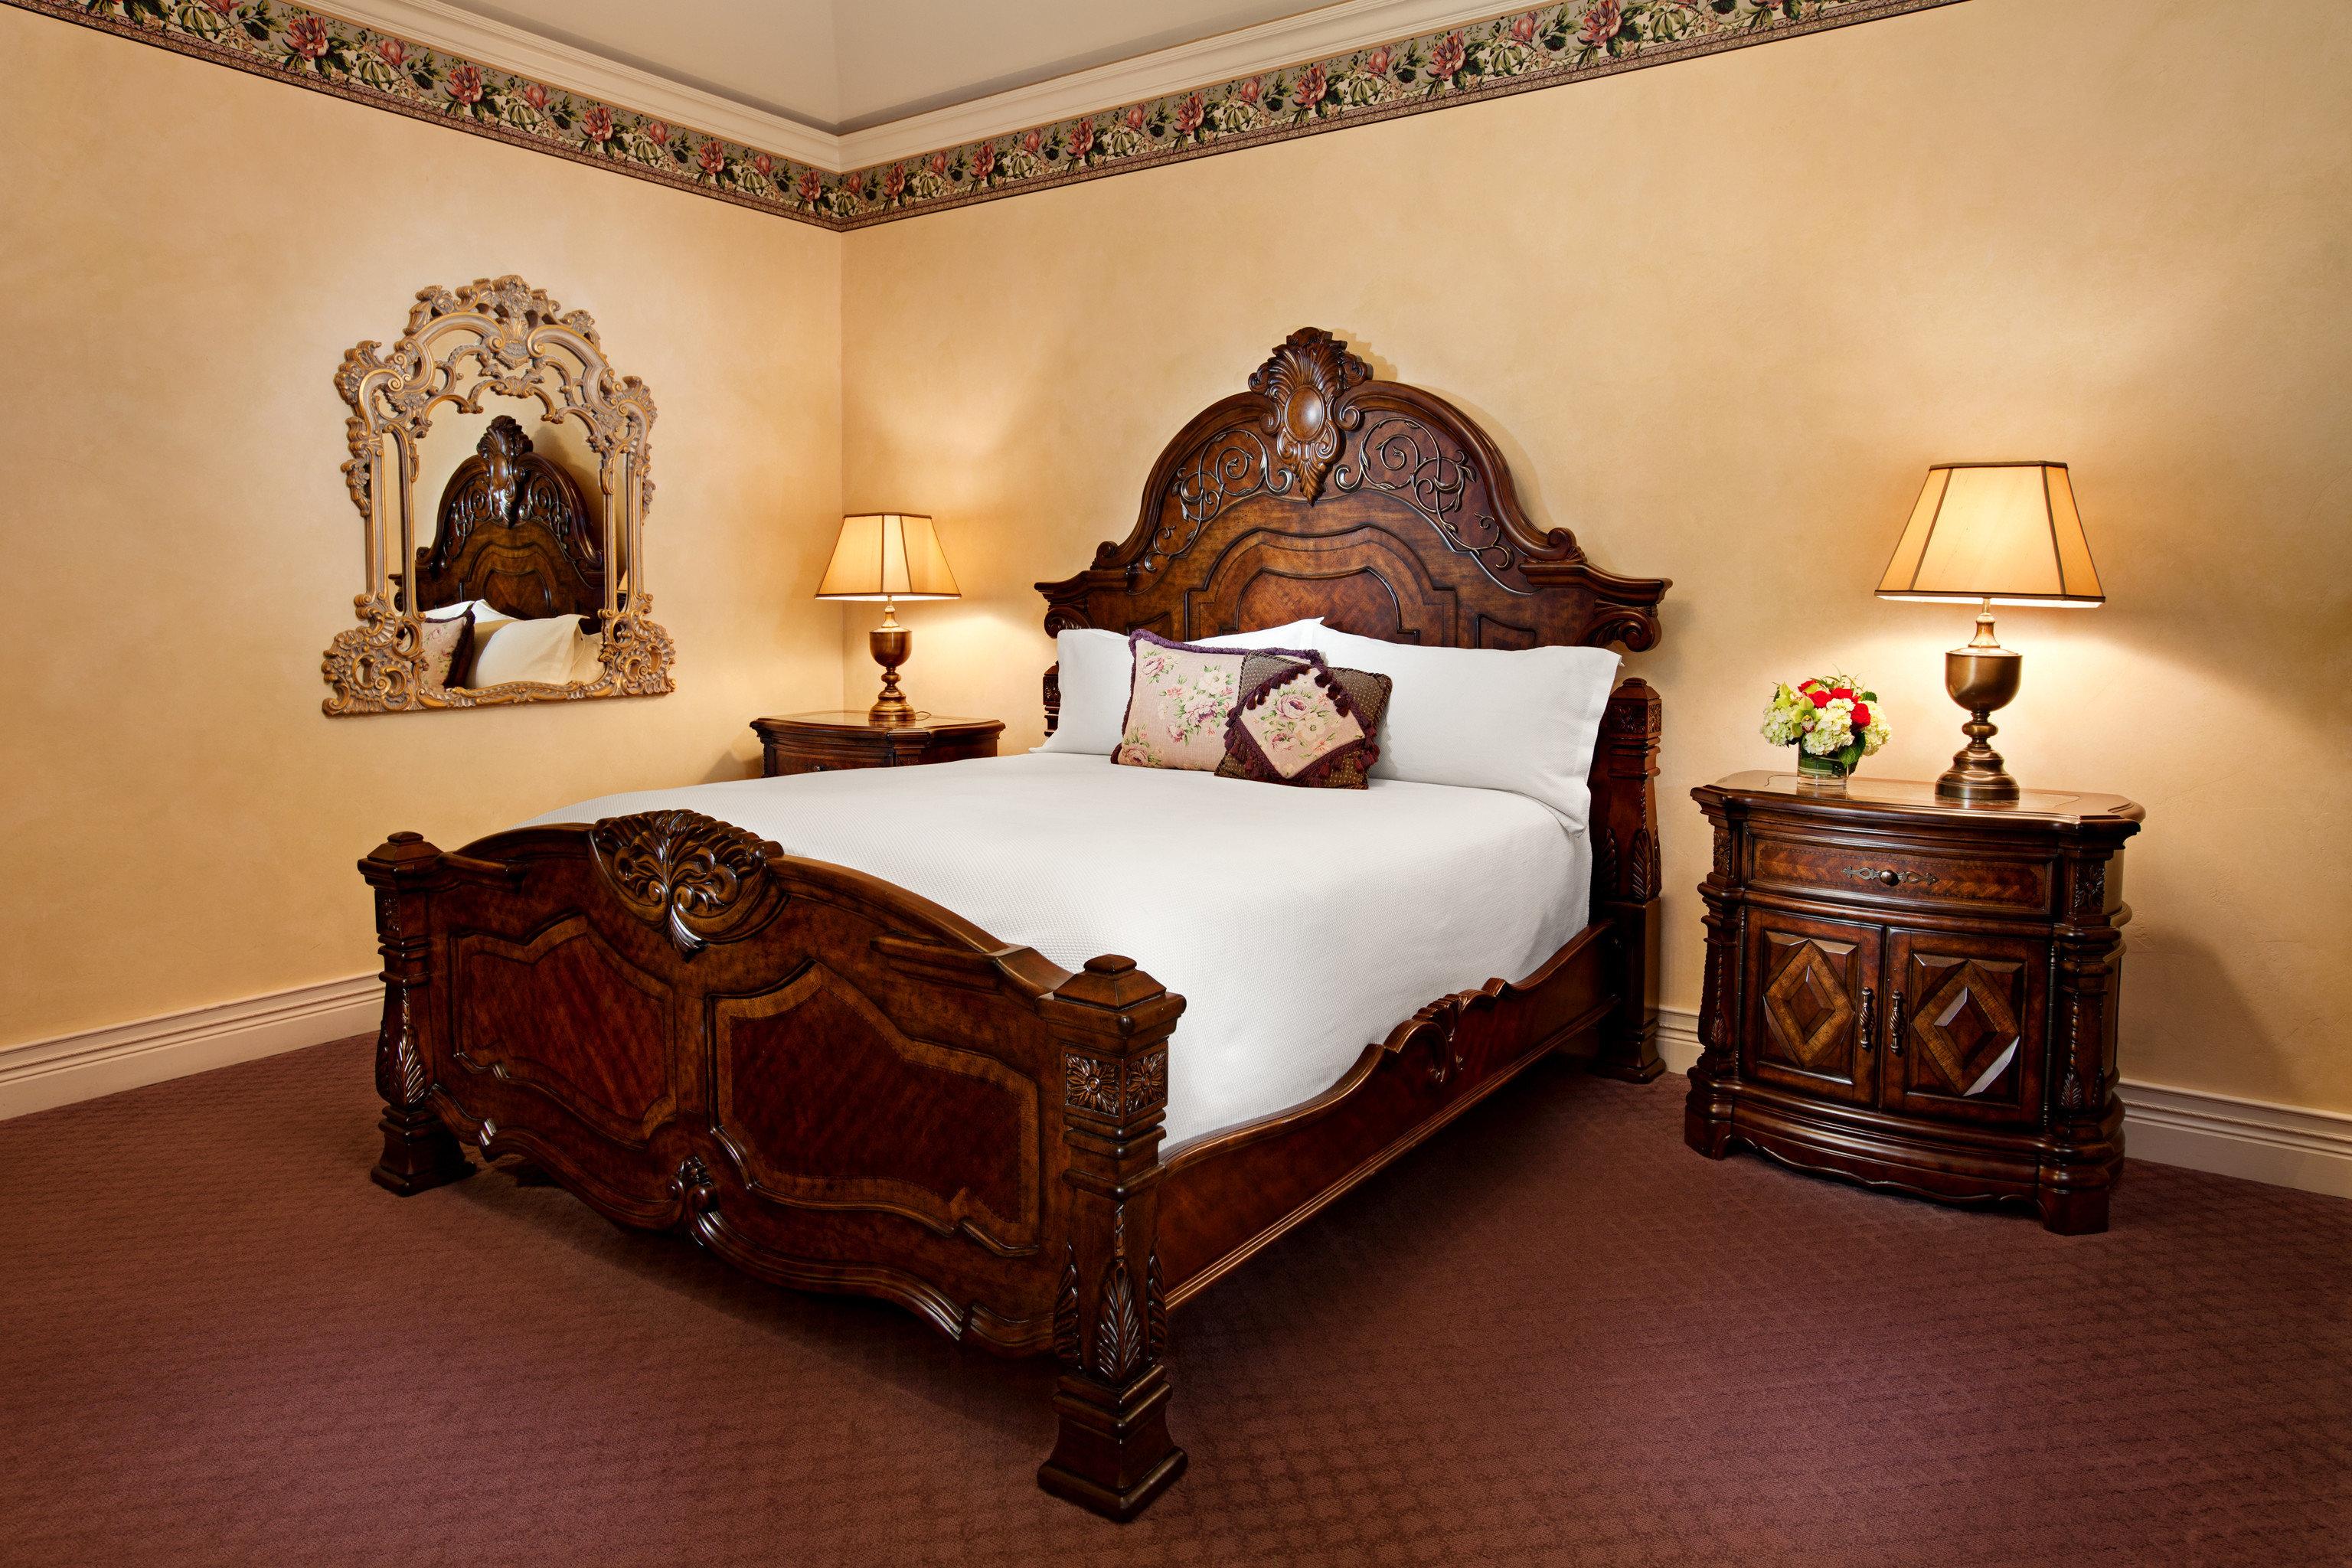 Bedroom Elegant Fireplace Historic Inn Romantic property hardwood Suite bed sheet bed frame living room wood flooring flooring antique lamp containing